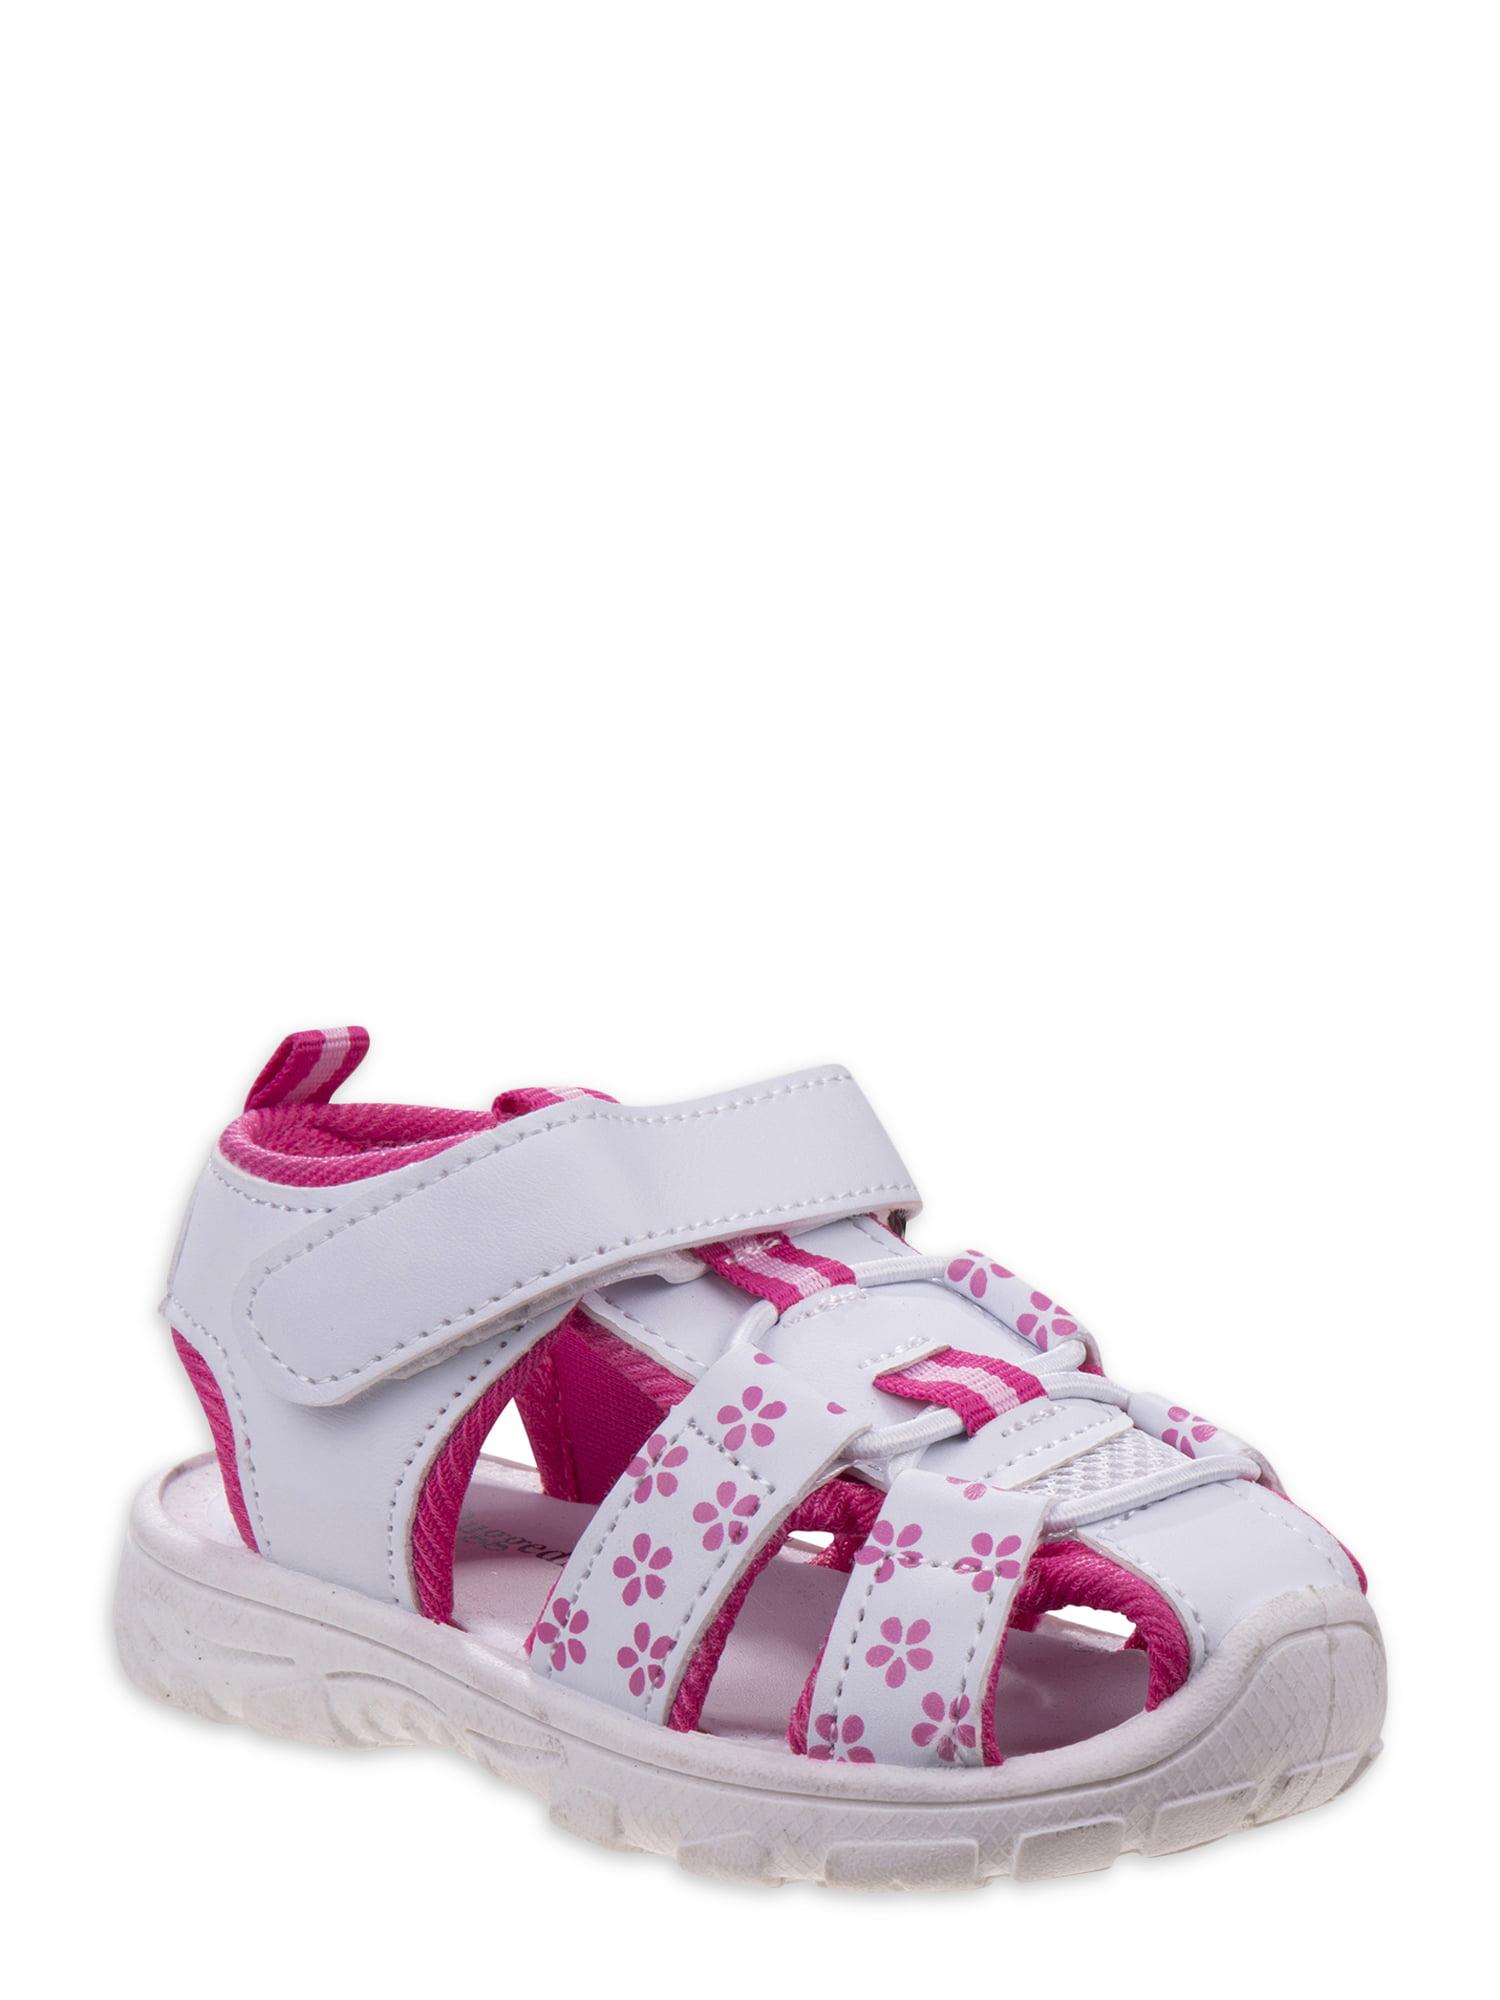 Active Sandal Toddler S